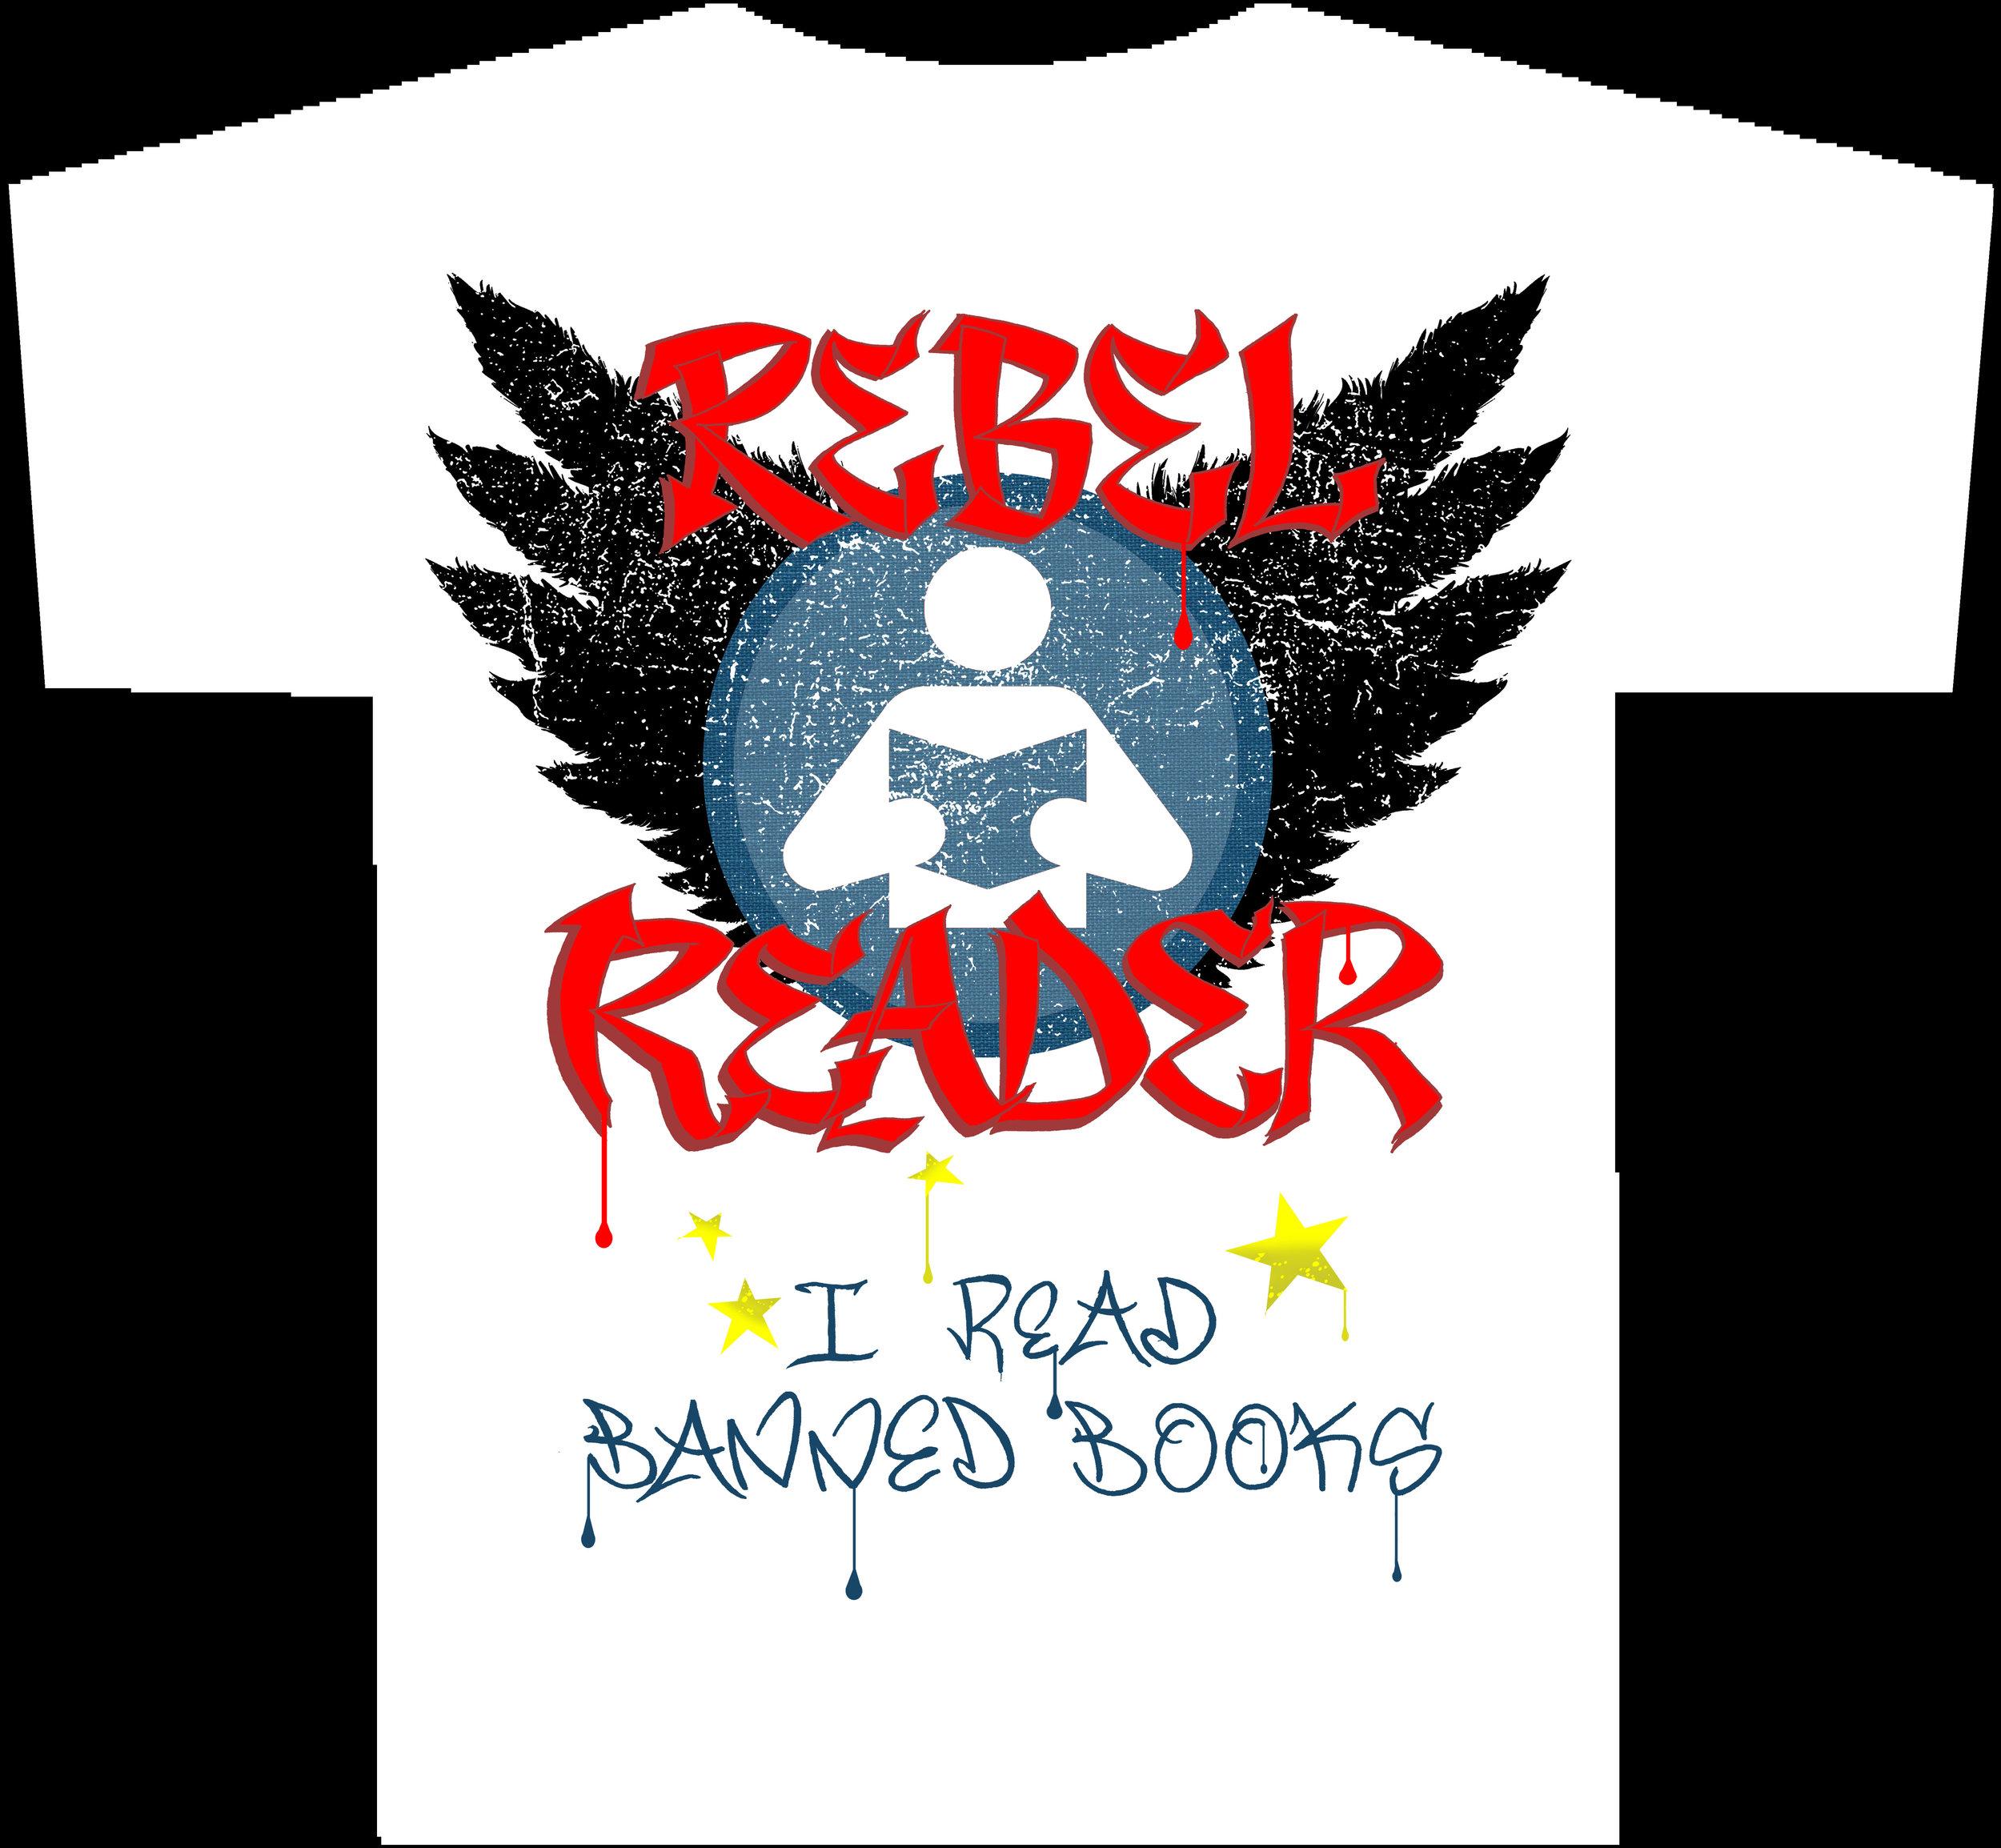 Rebel Reader (Banned Books)